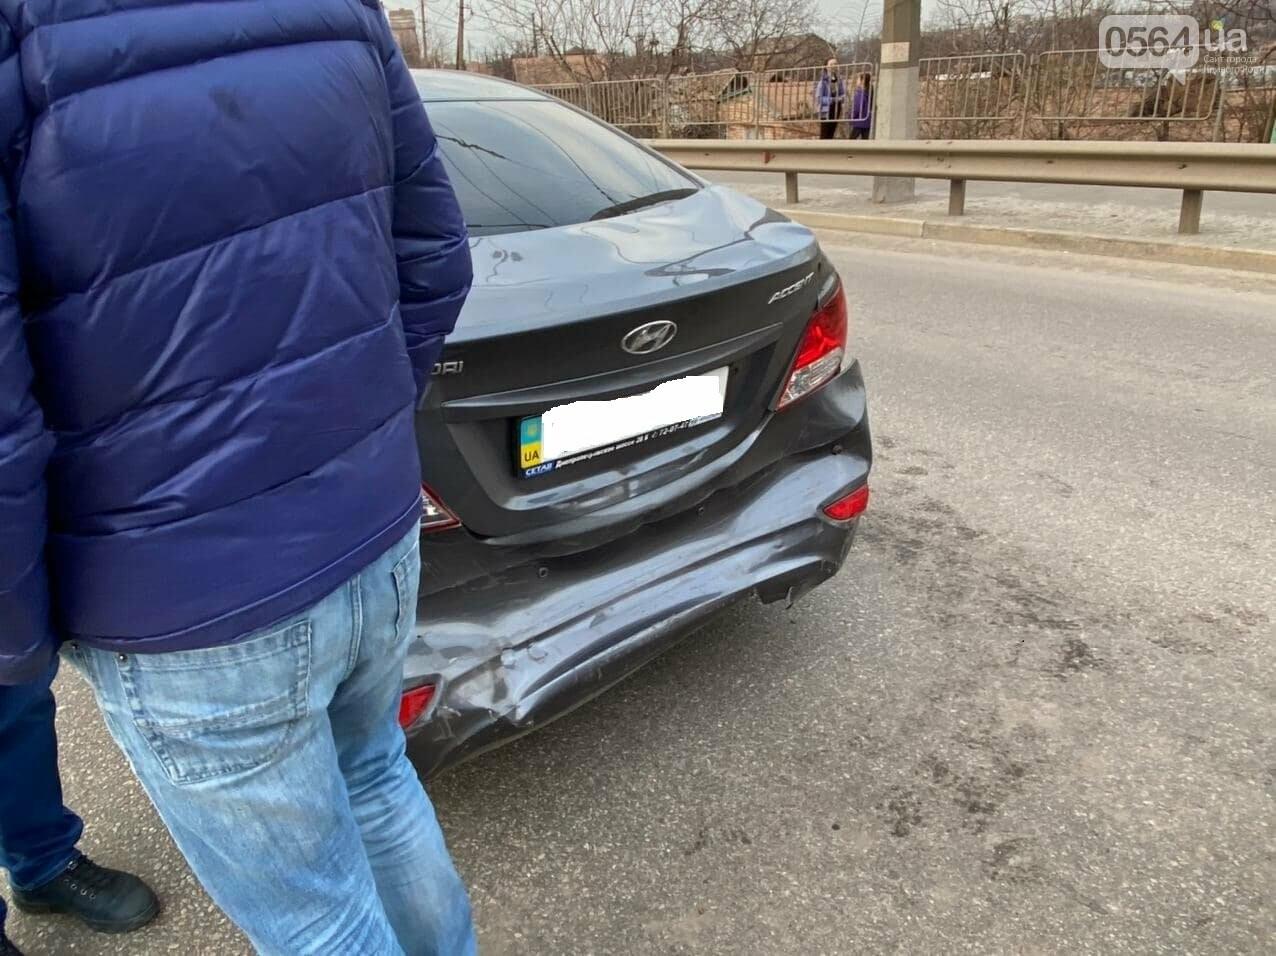 5 машин разбились в ДТП в Кривом Роге, - ФОТО, фото-7